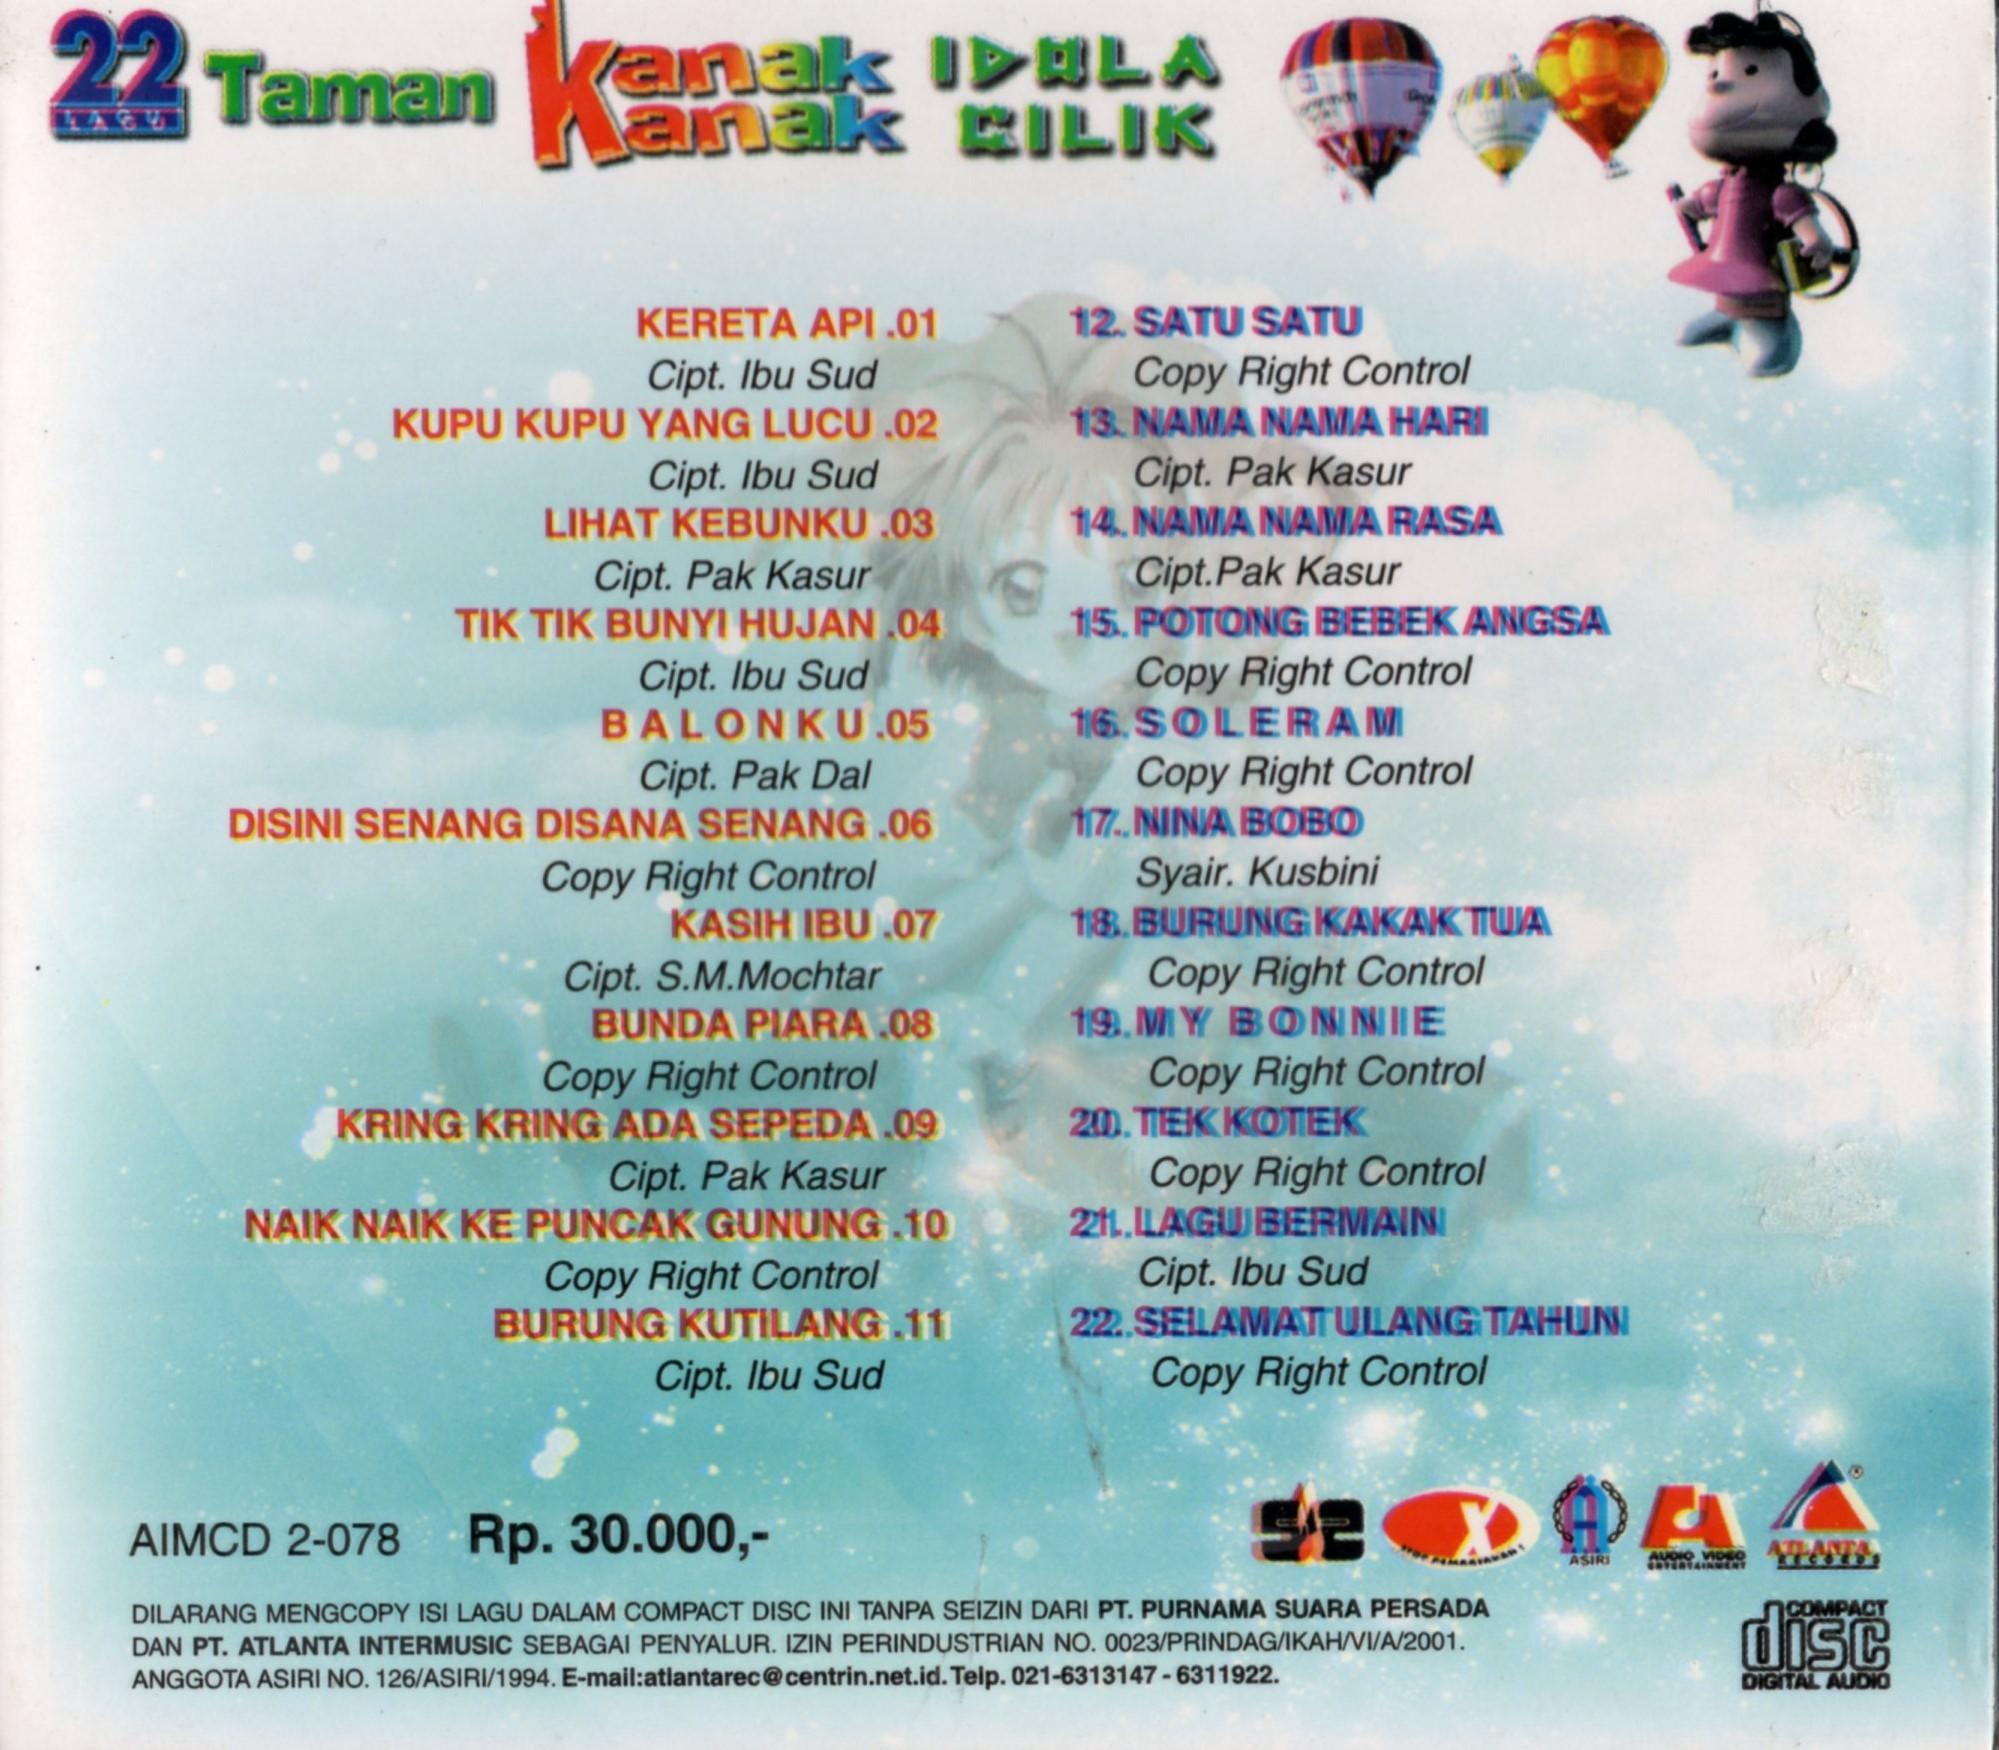 CD AUDIO ORIGINAL 22 LAGU TAMAN KANAK KANAK IDOLA CILIK